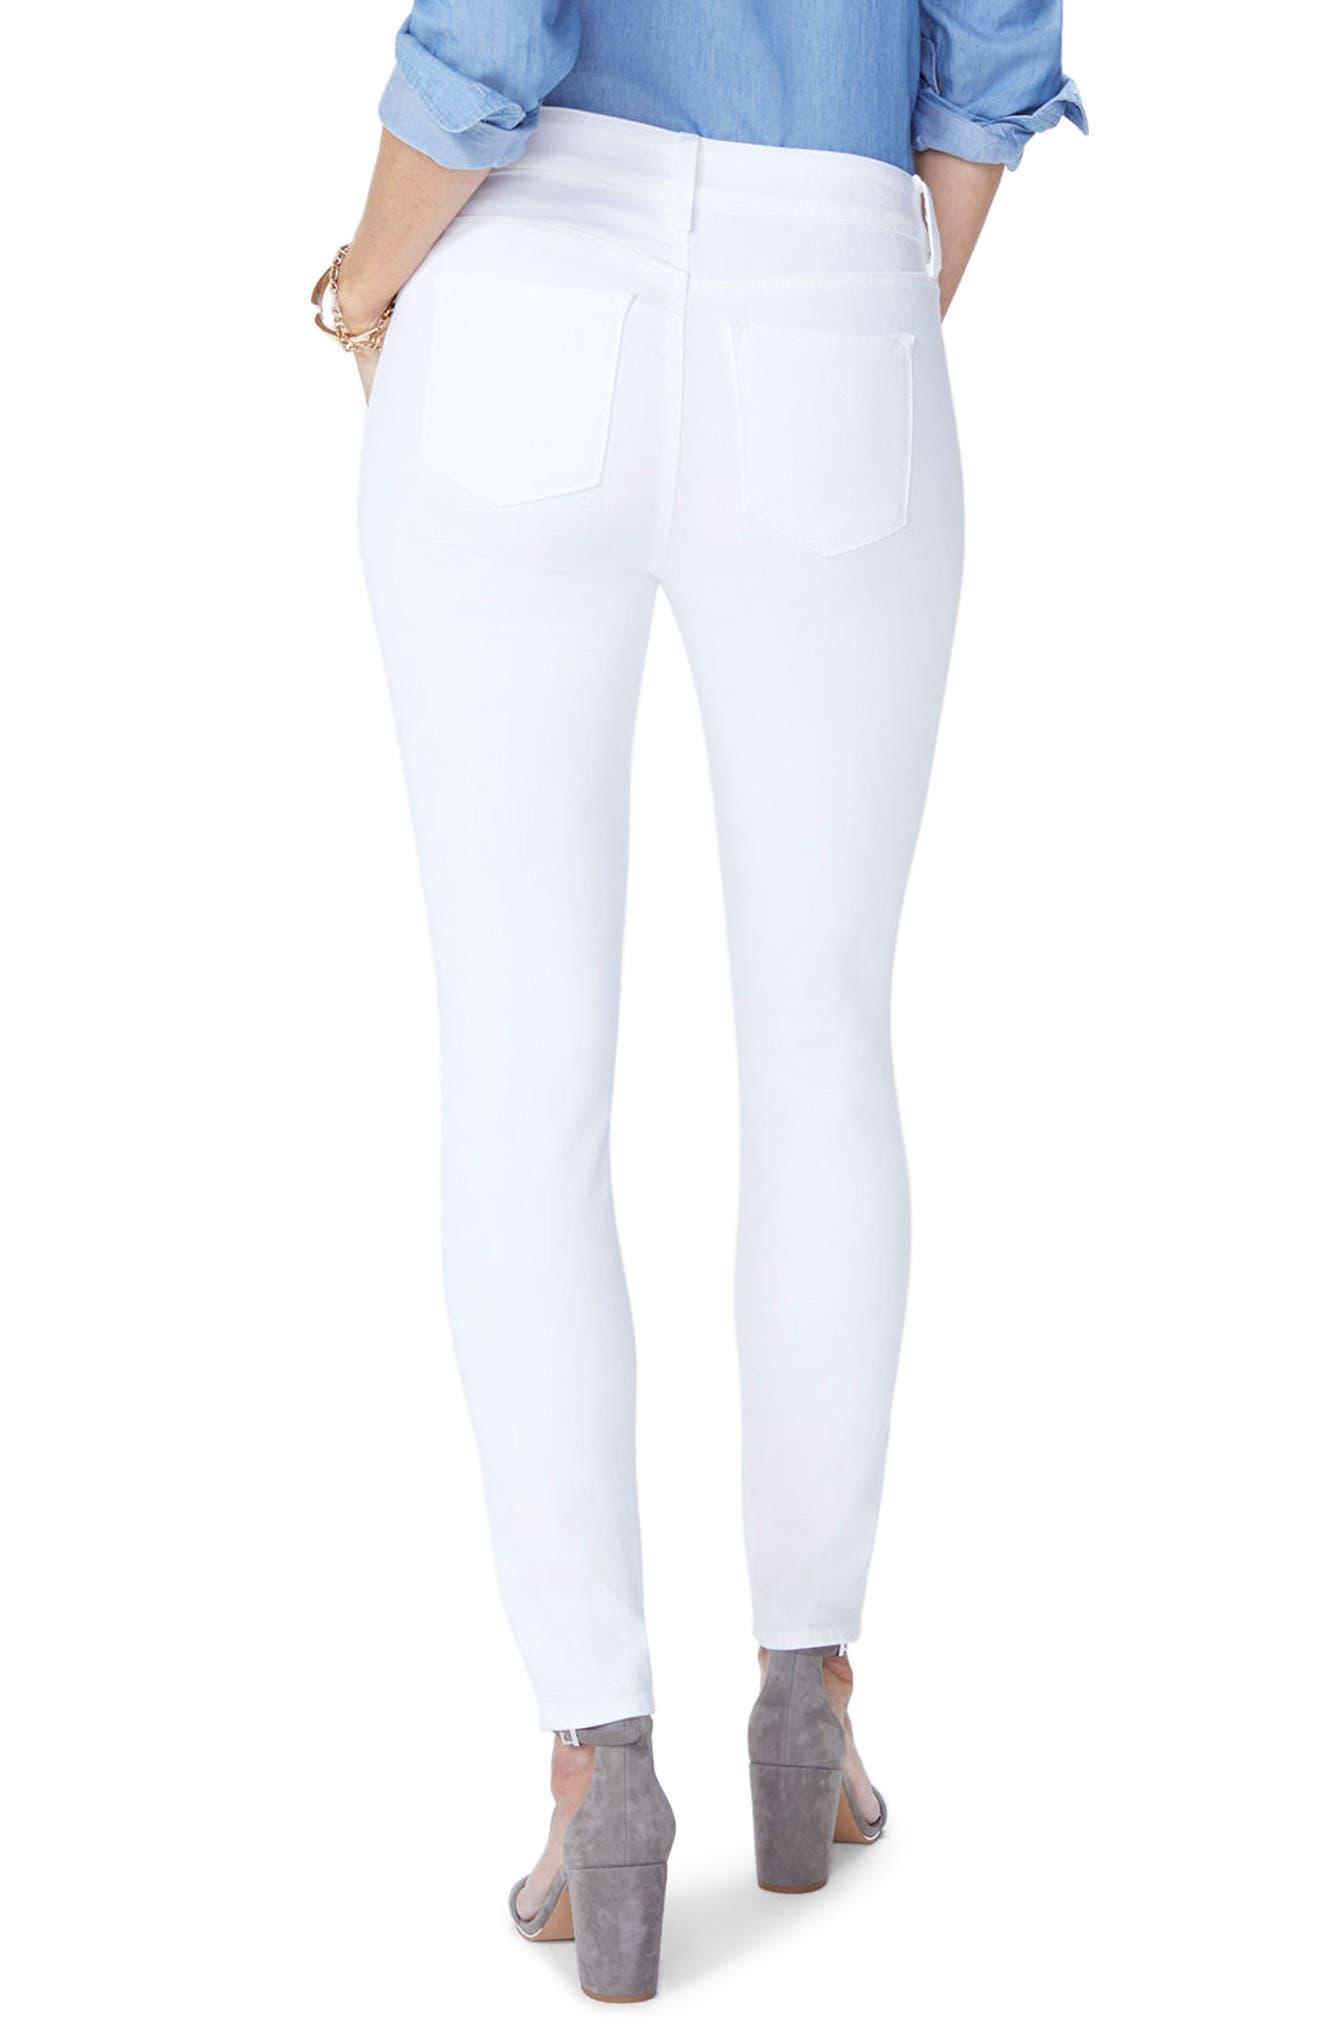 Ami Skinny Jeans,                             Alternate thumbnail 2, color,                             Optic White